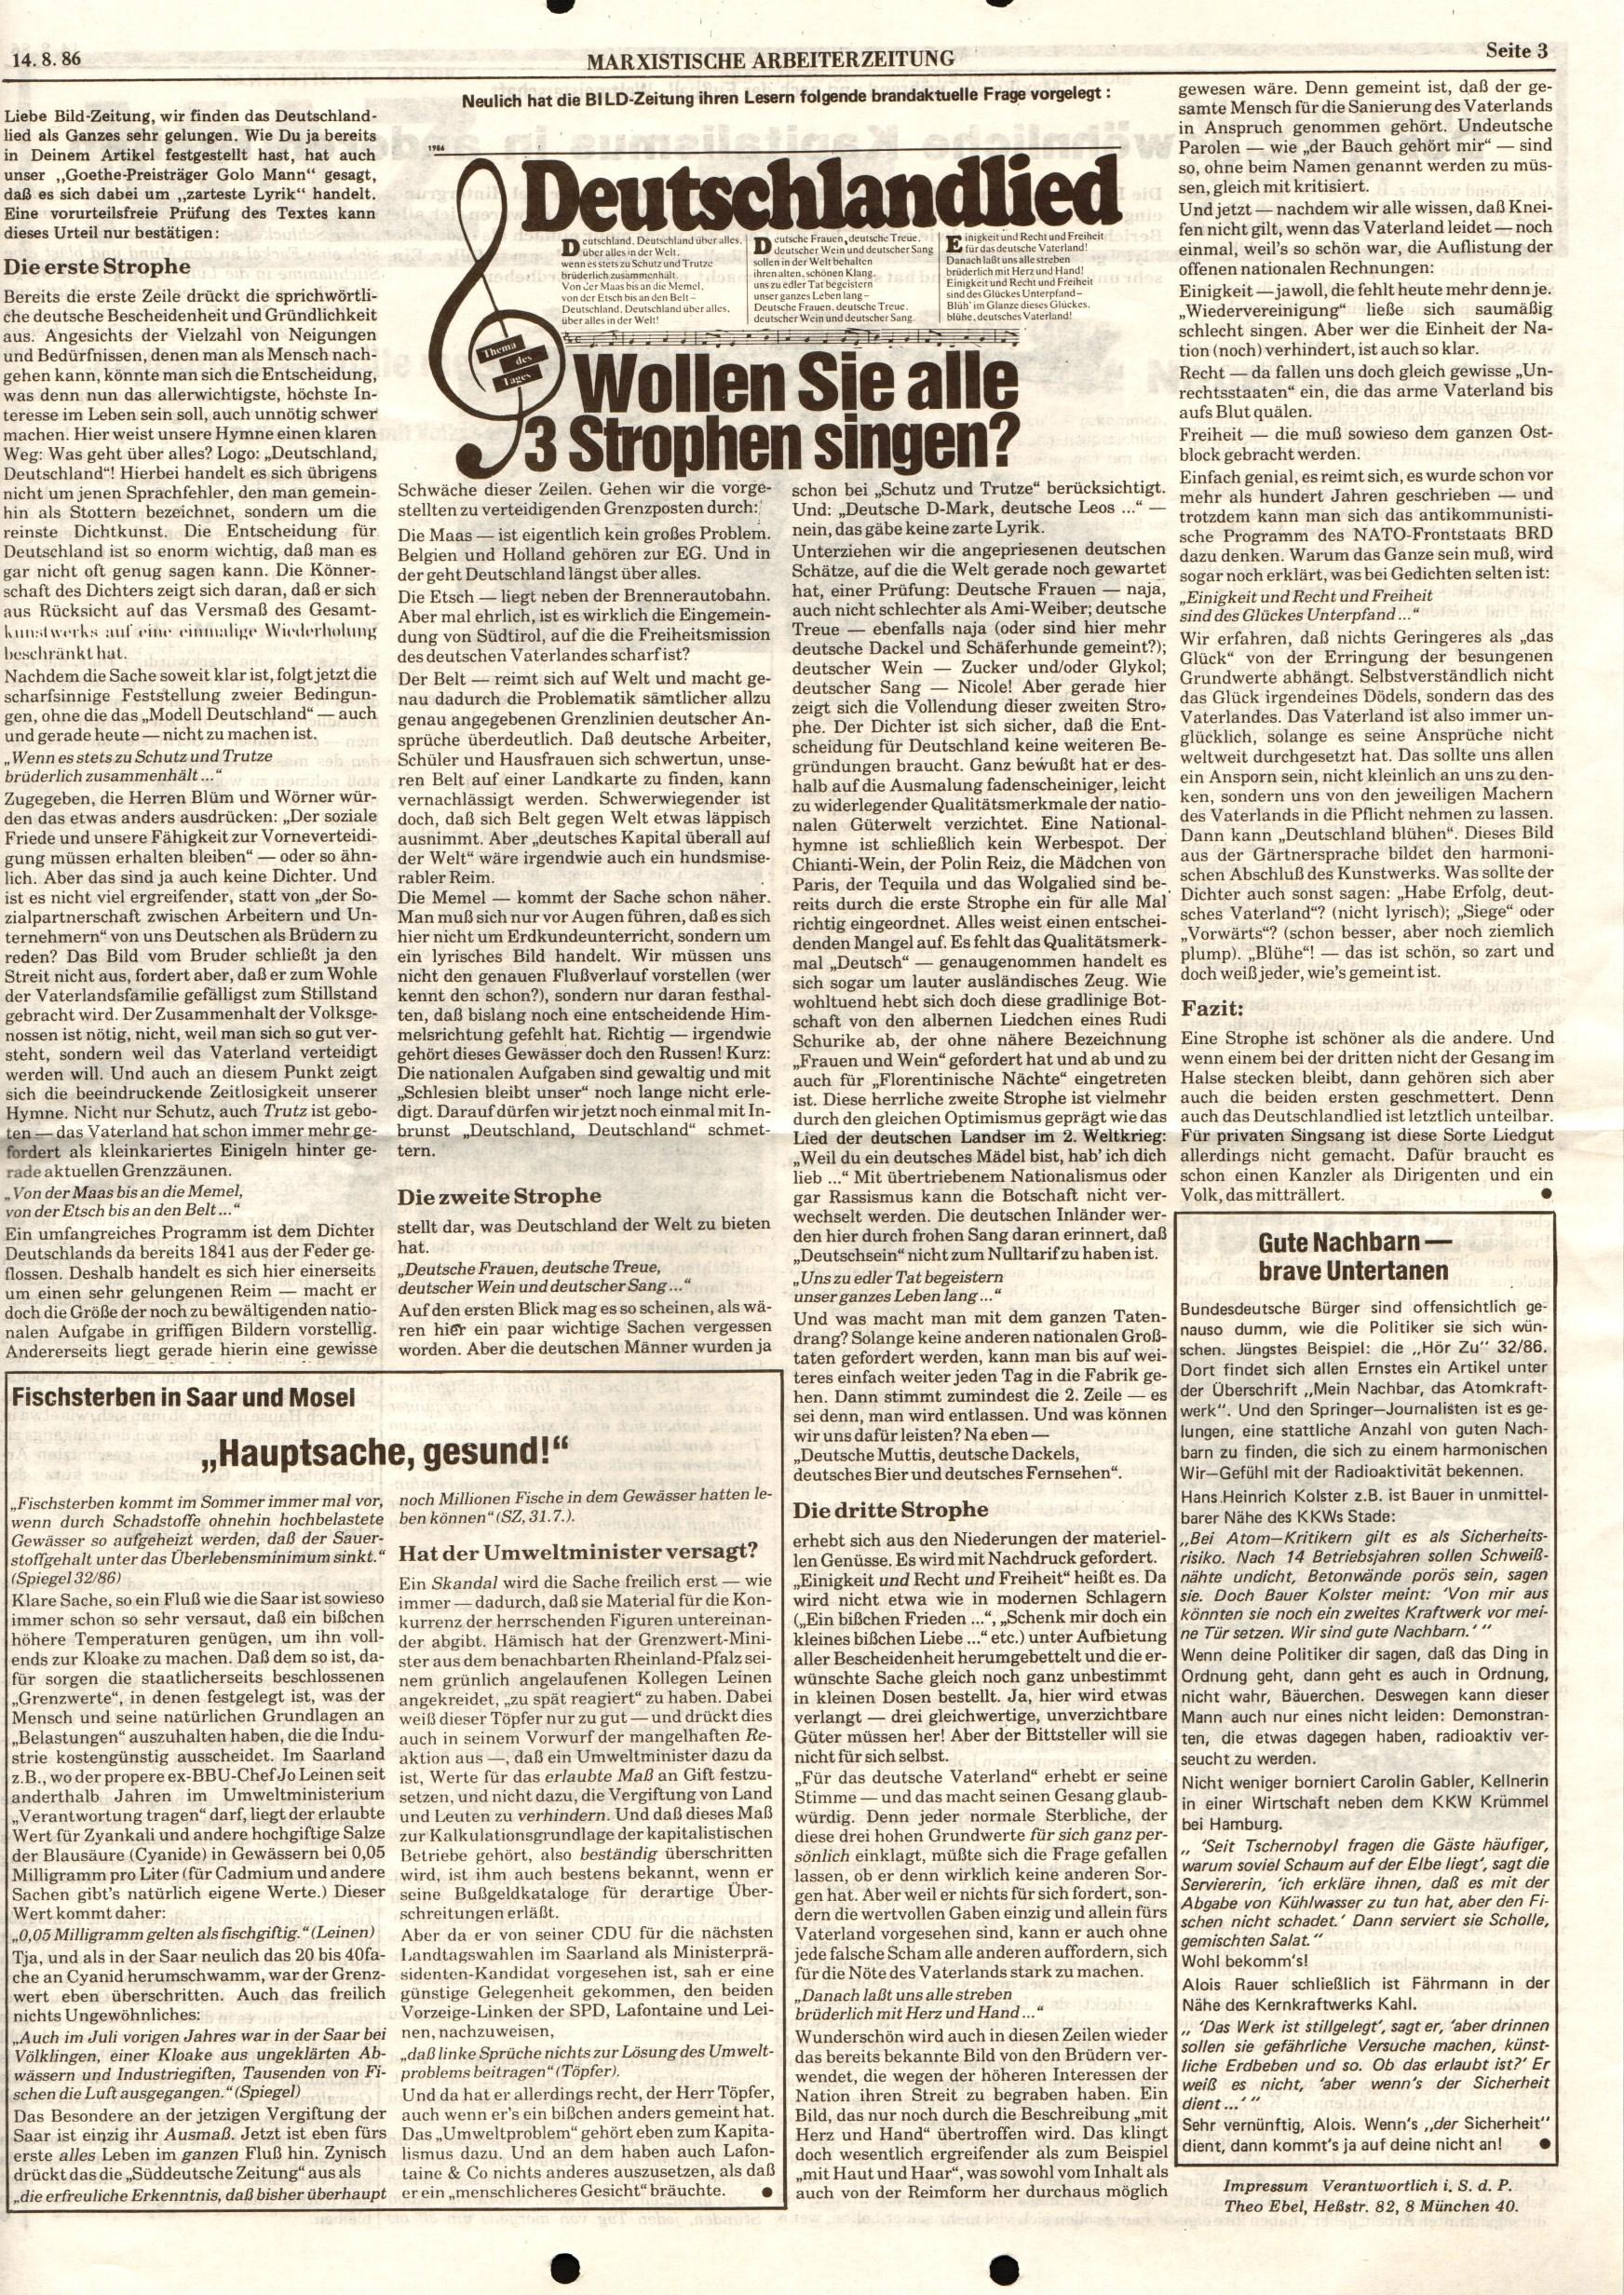 Frankfurt_CPK_Hoechst_MAZ391